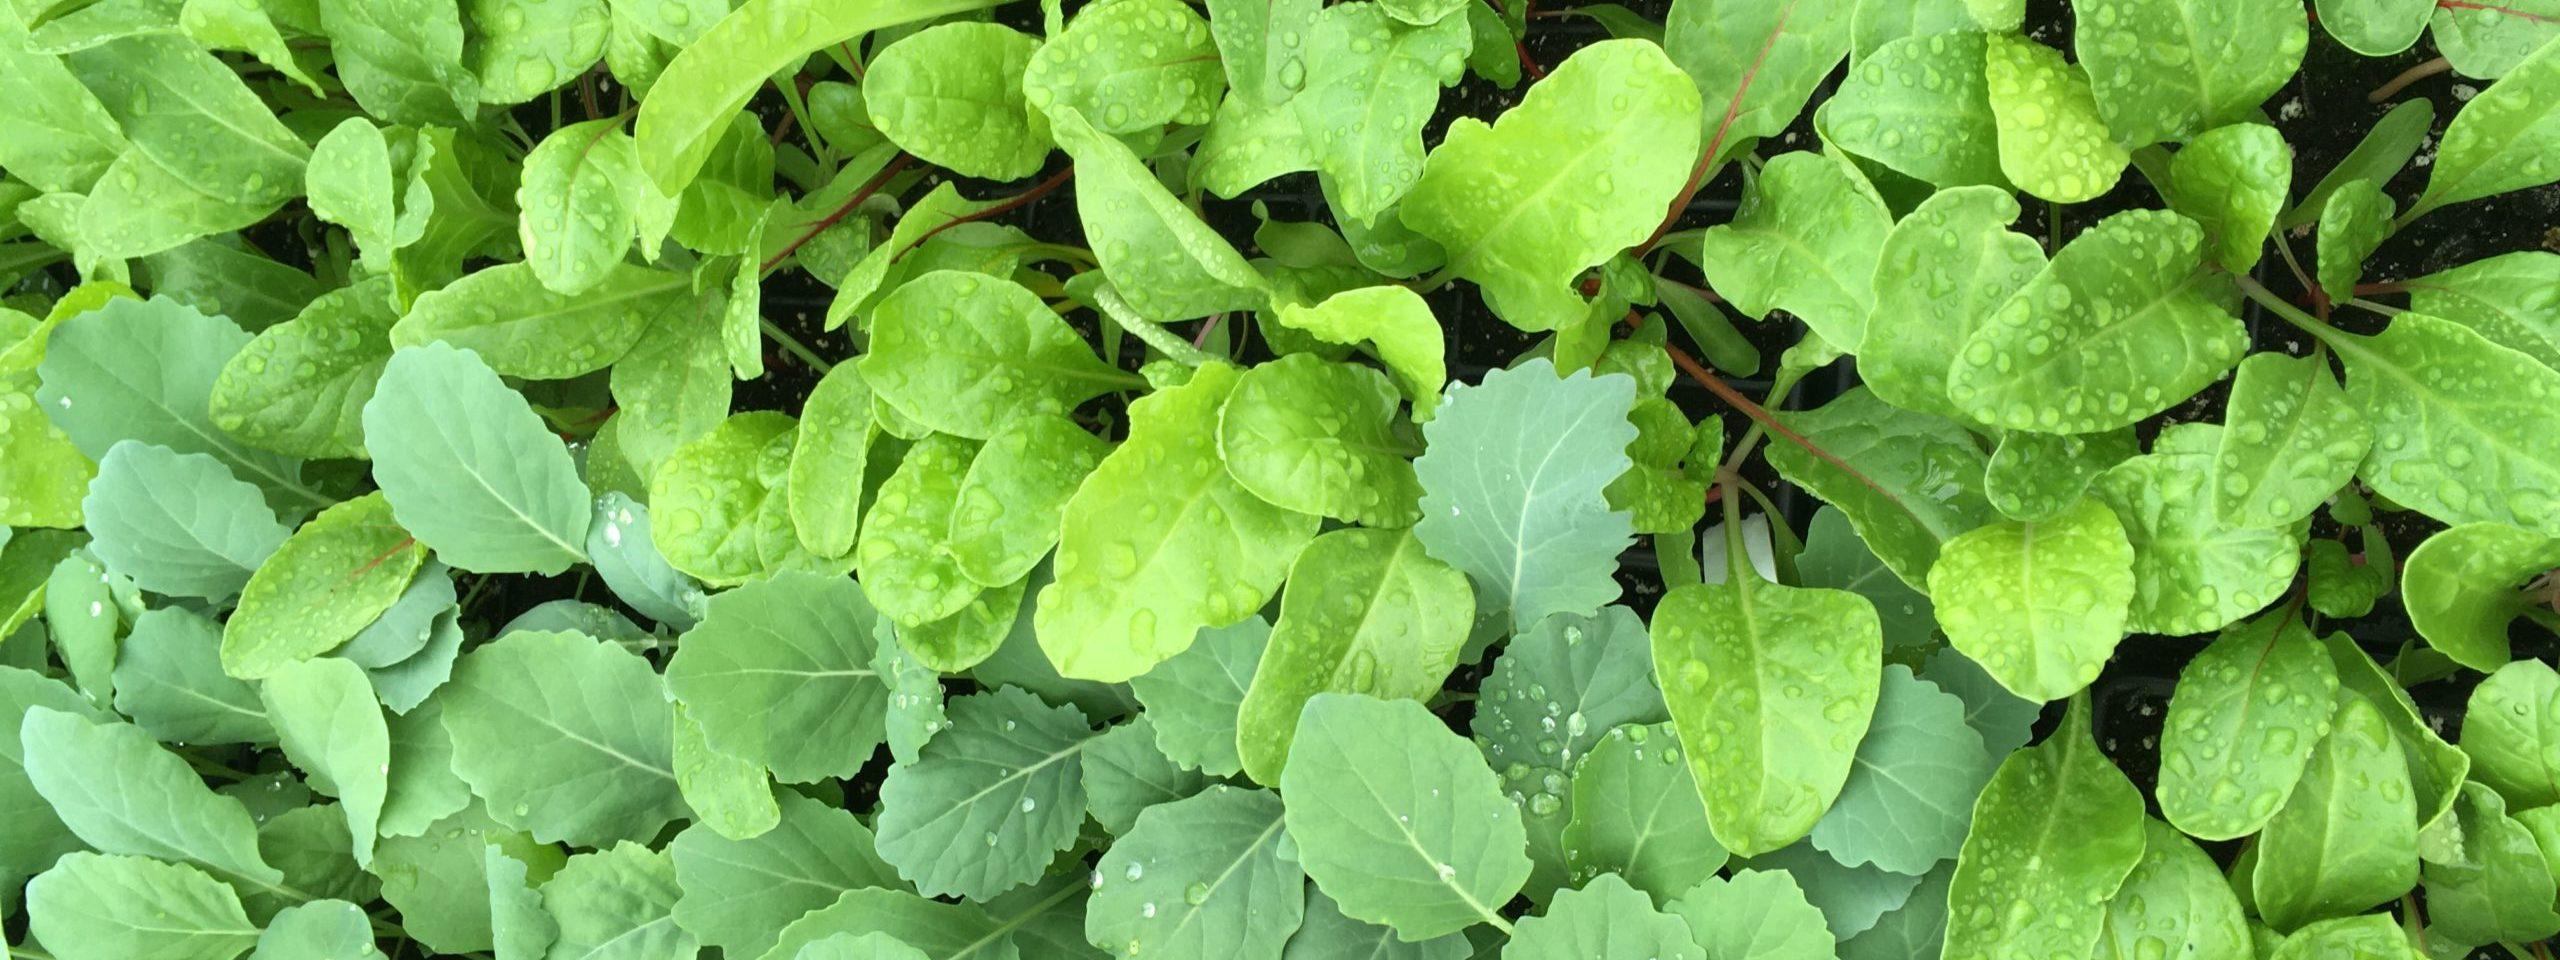 Soil Health & Seedlings